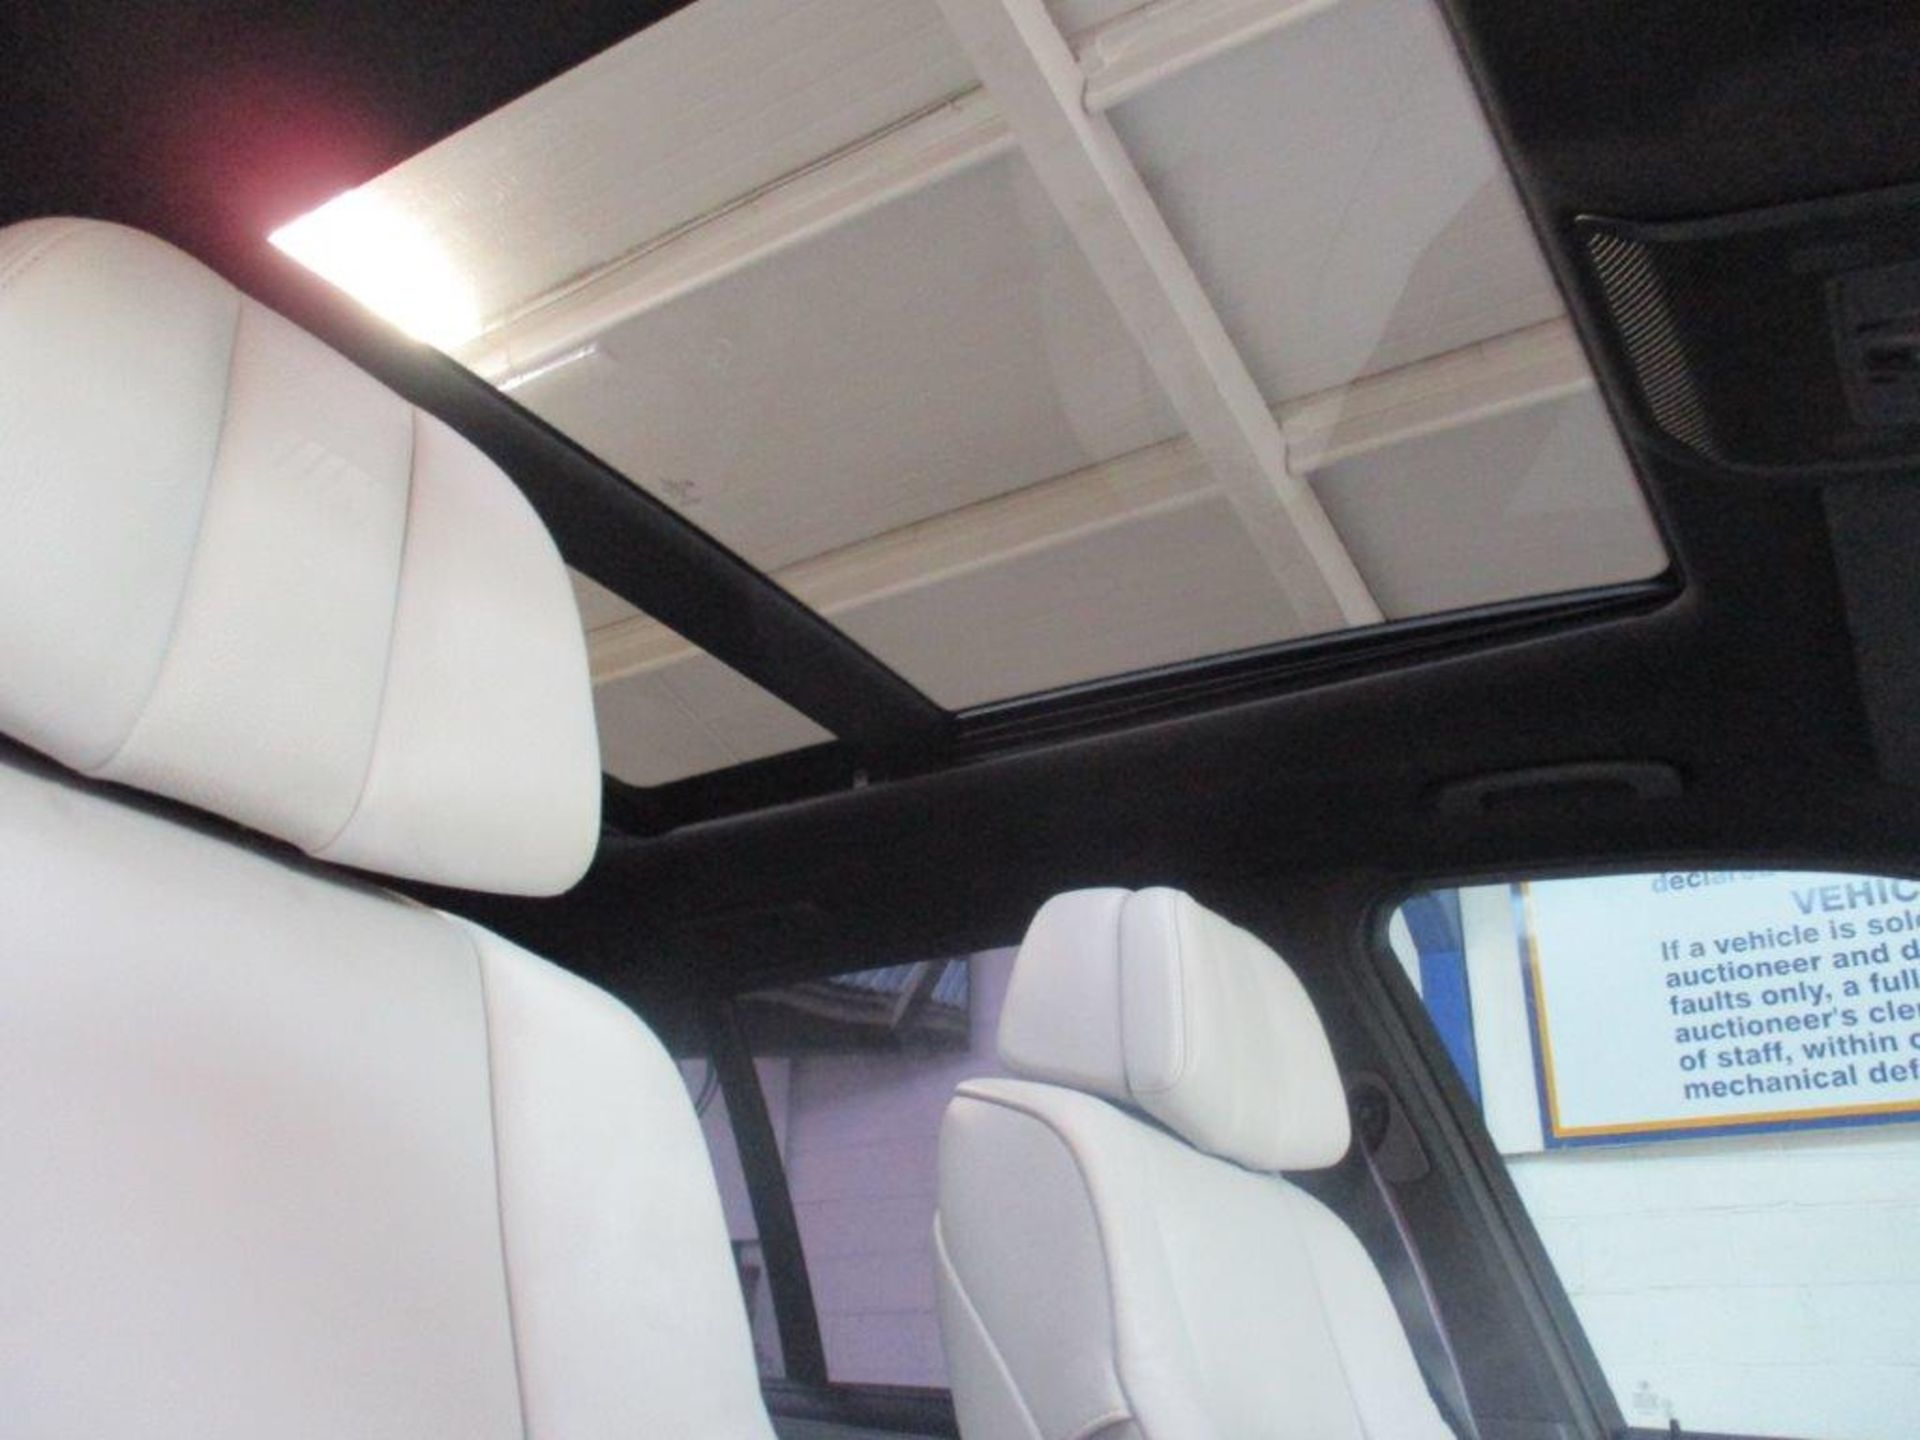 60 10 BMW X5 M Turbo Auto - Image 23 of 35